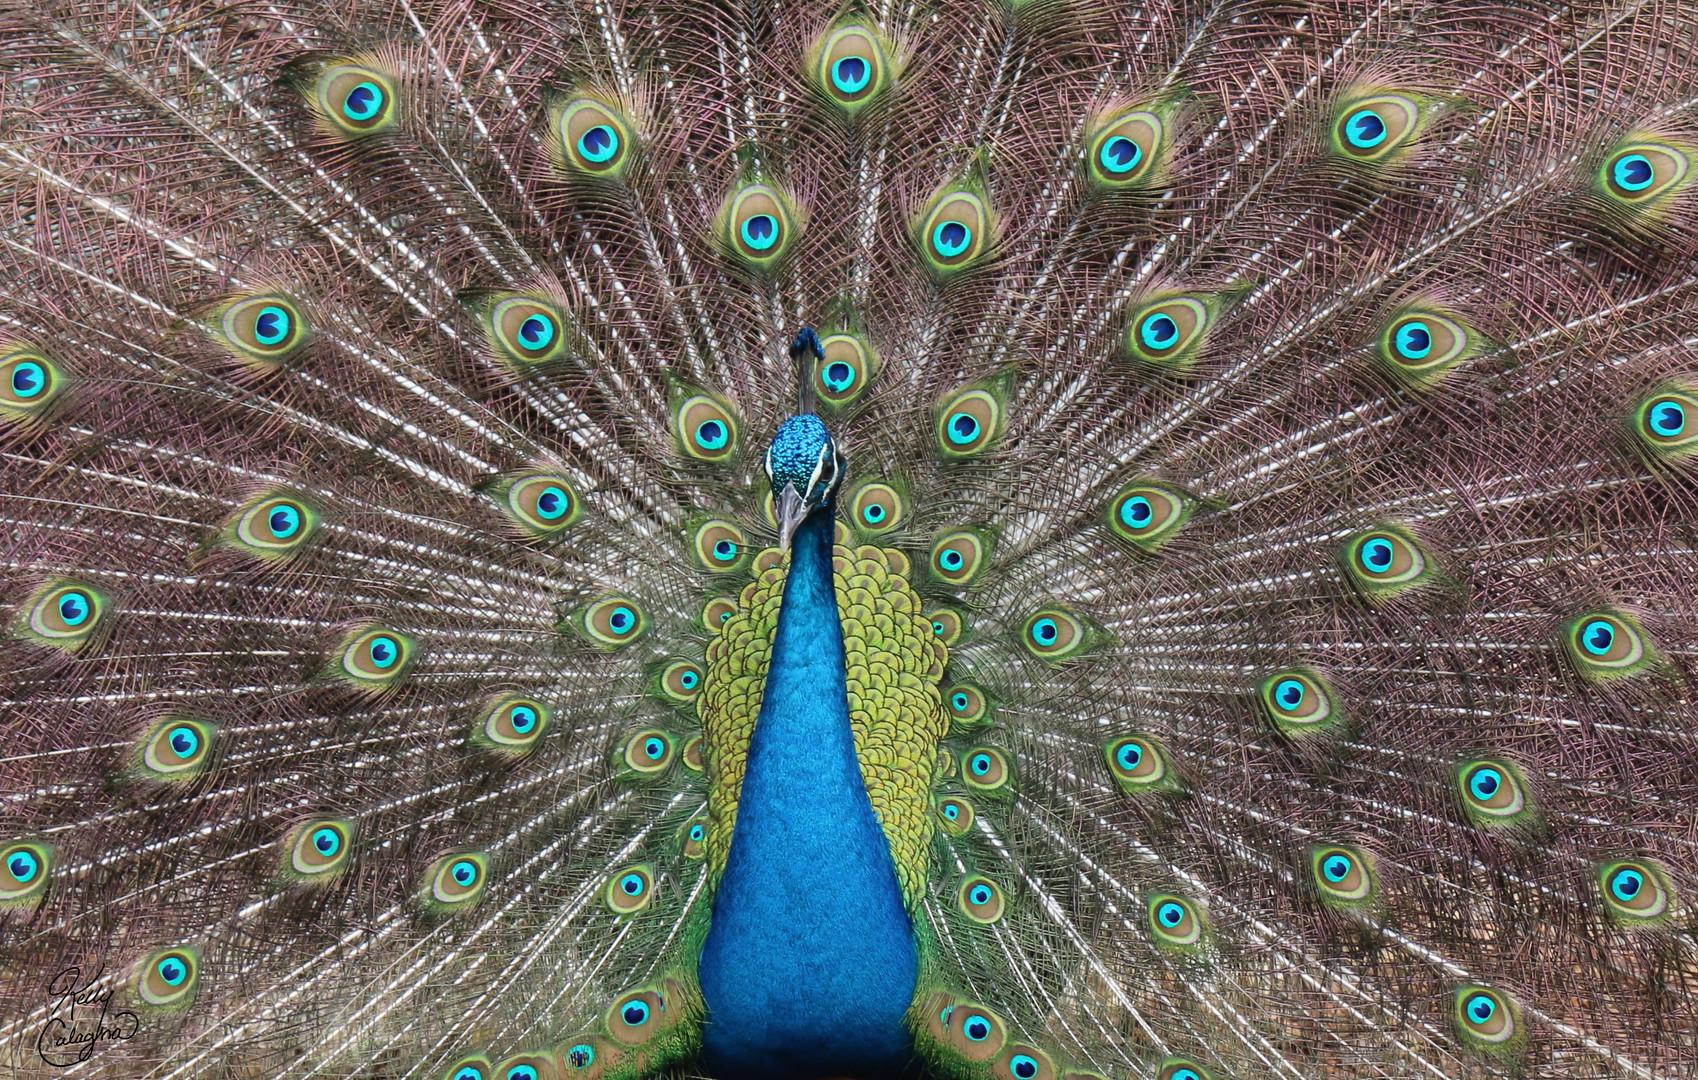 Peacock Display, Texas.JPG